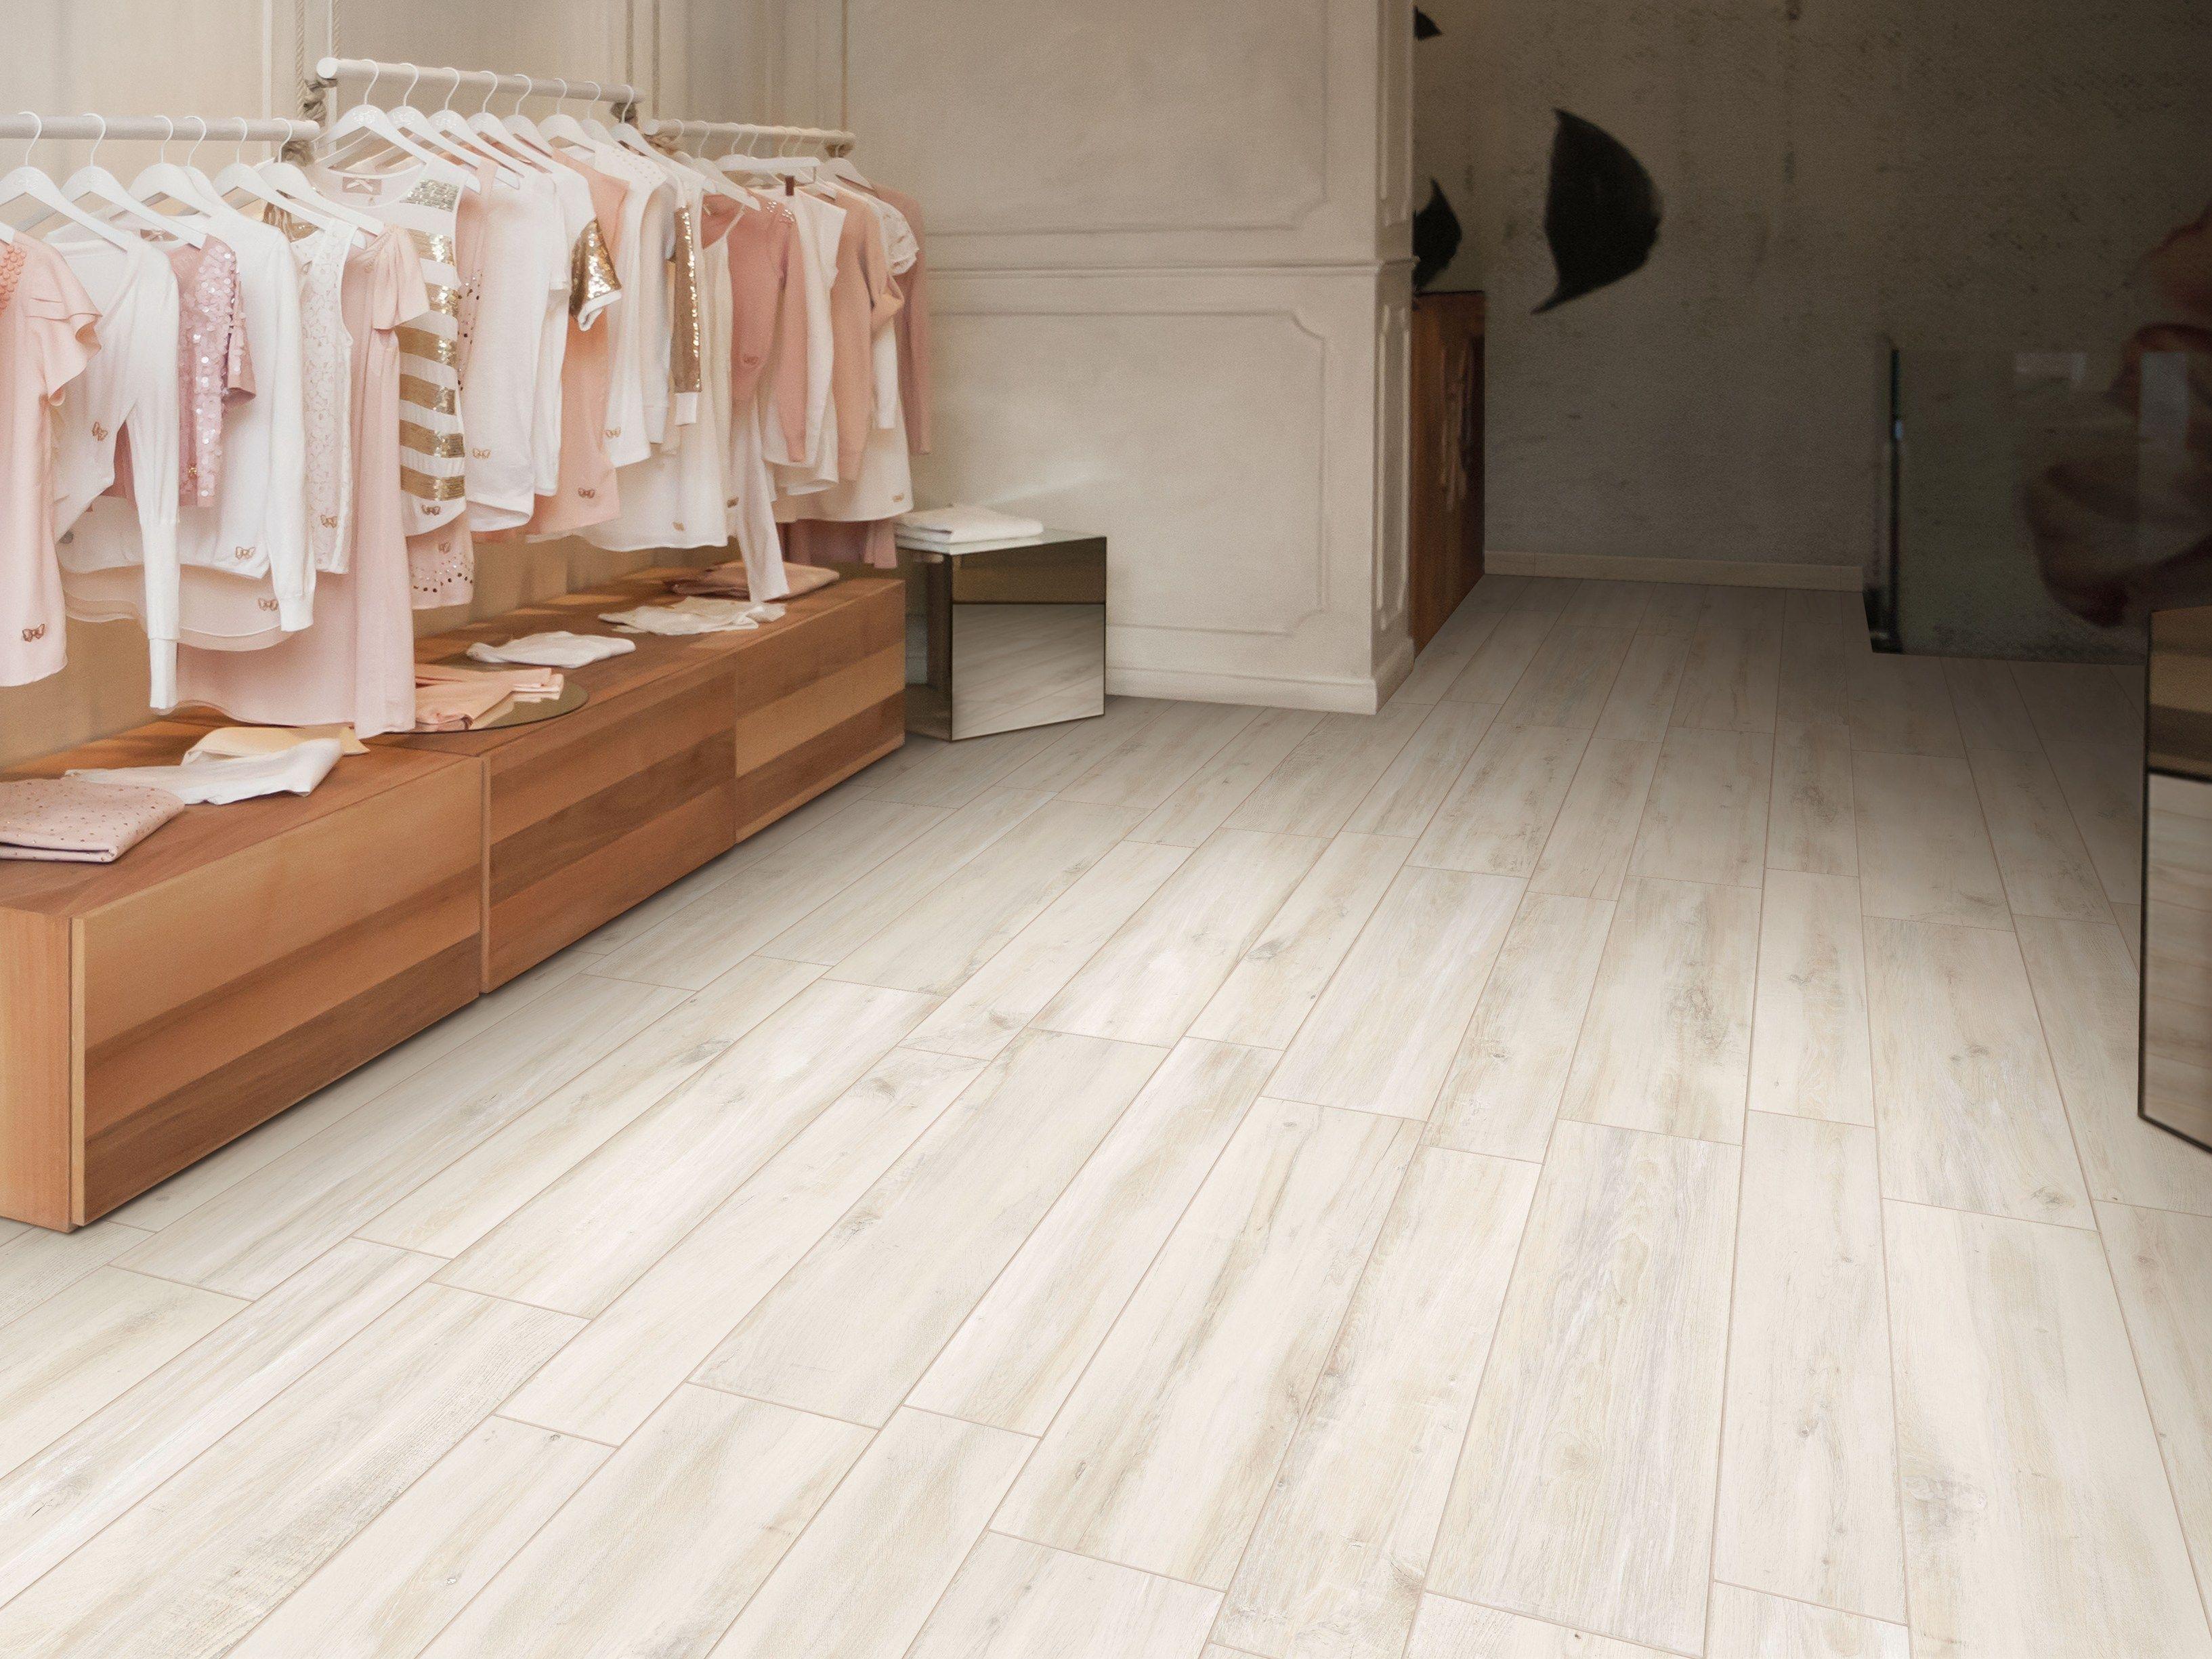 Pavimento de gres porcel nico imitaci n madera decap by - Pavimento imitacion madera ...